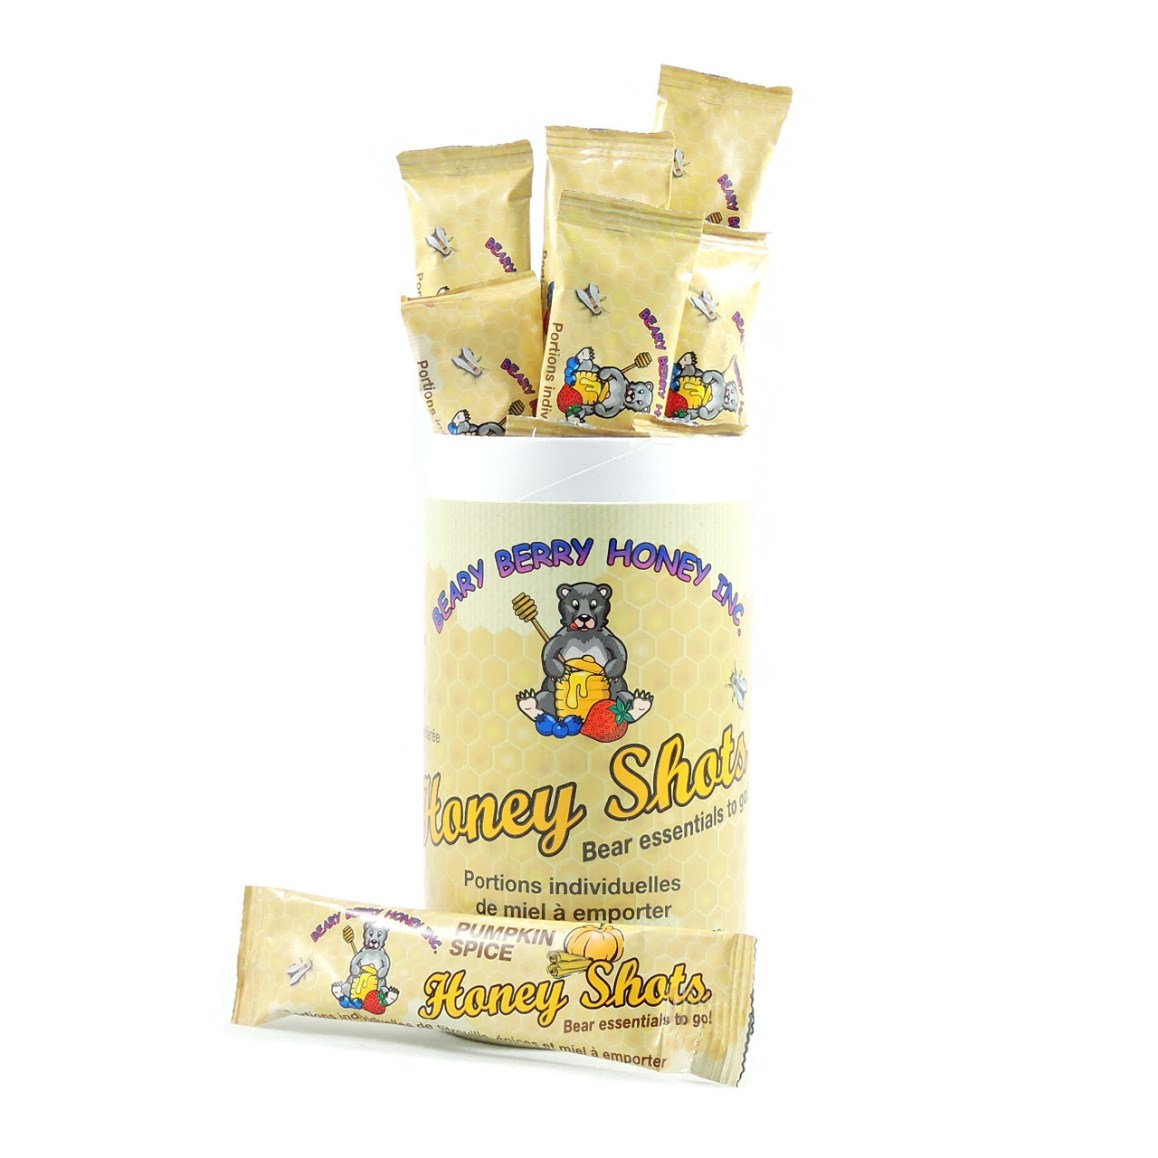 Assorted Honey Shots 875294001091